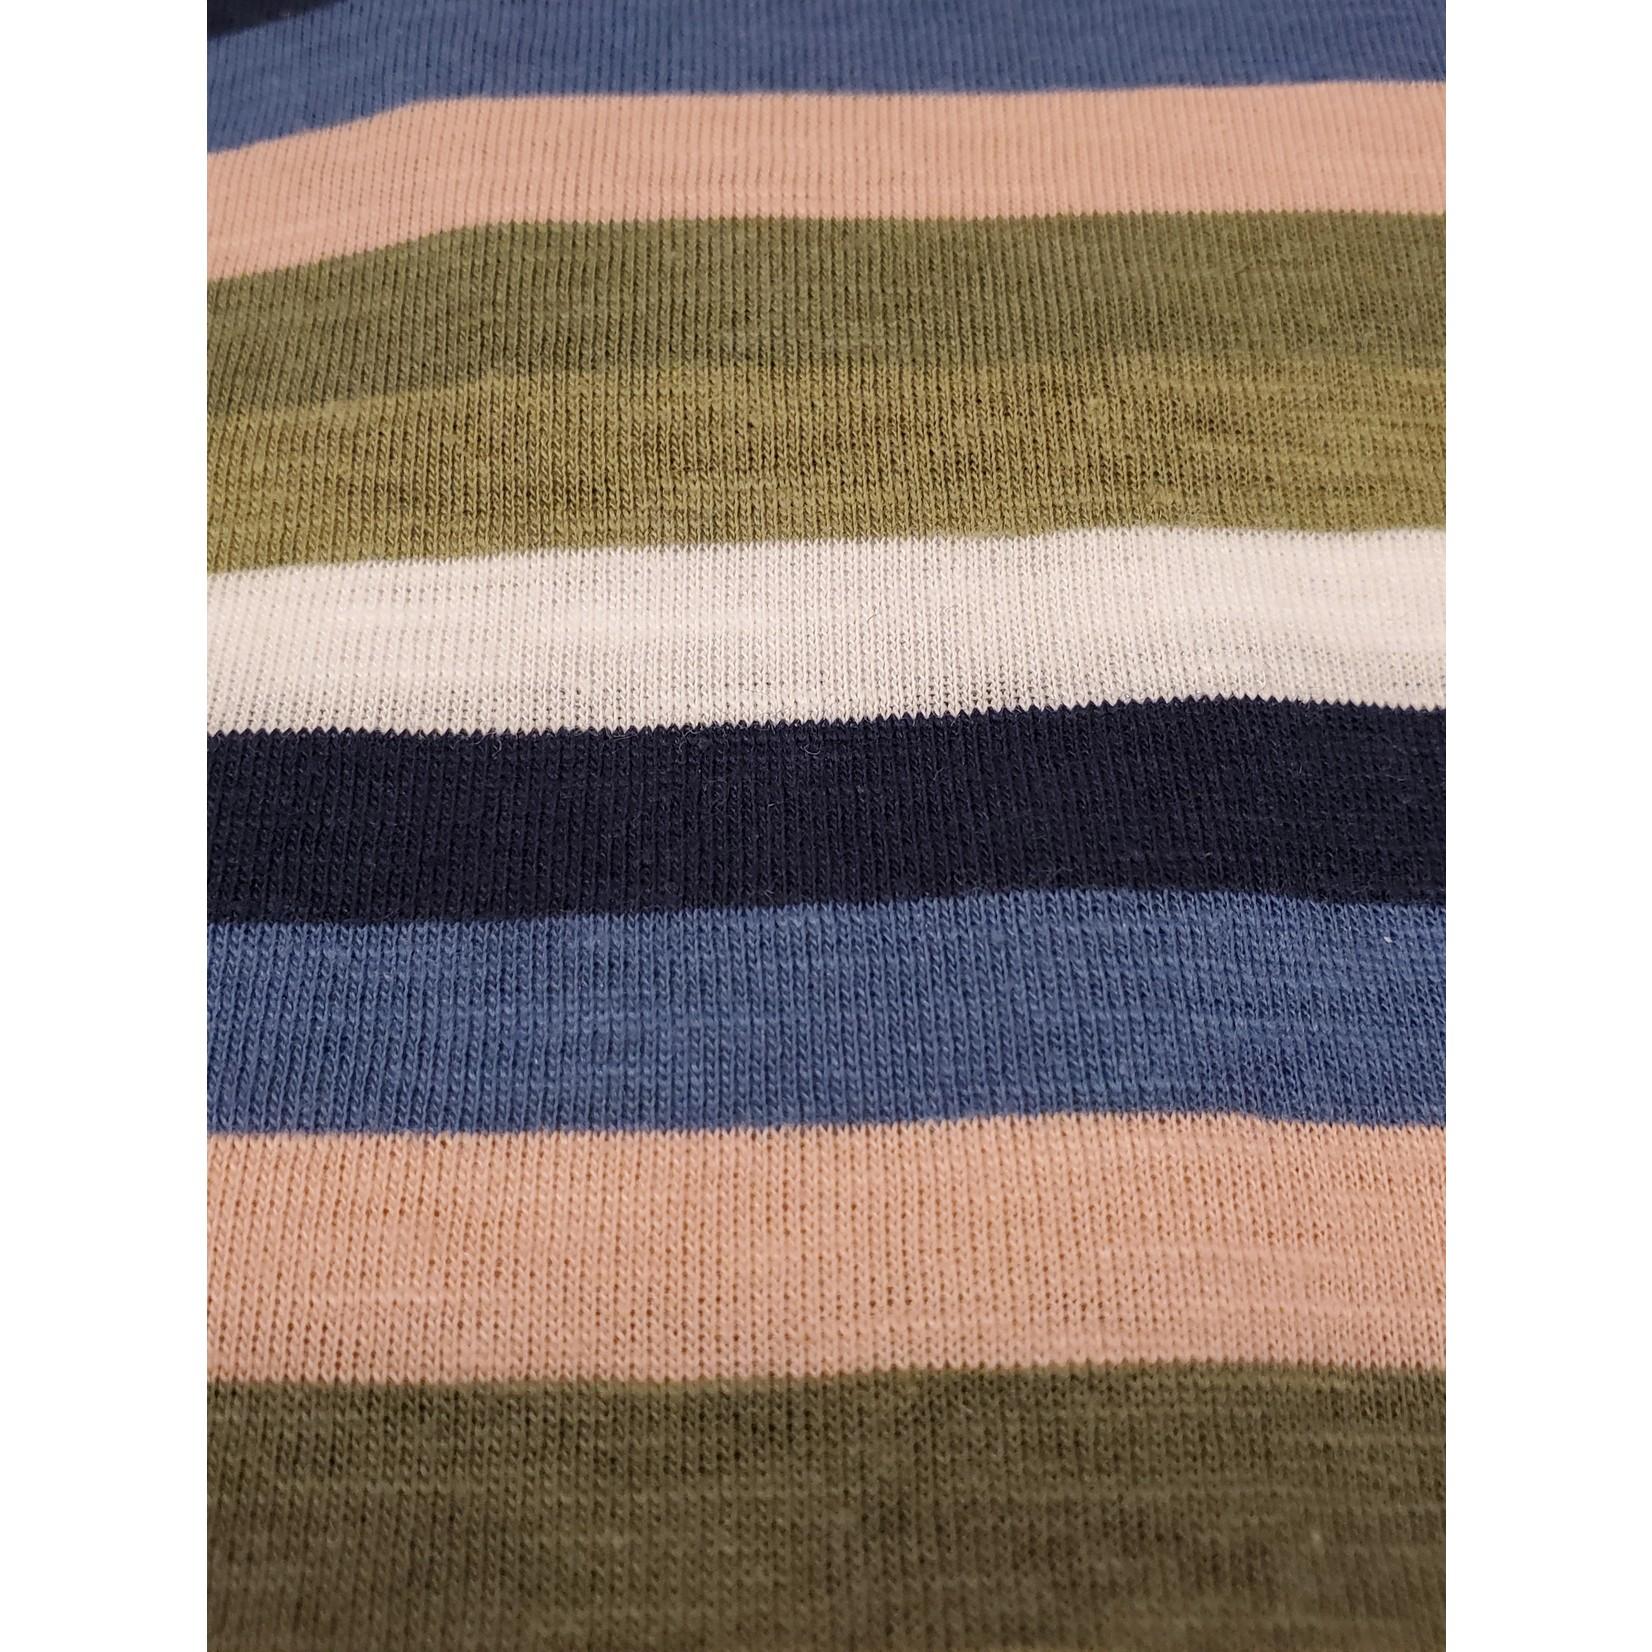 Blend Blend 20712081 Multi Striped Tee